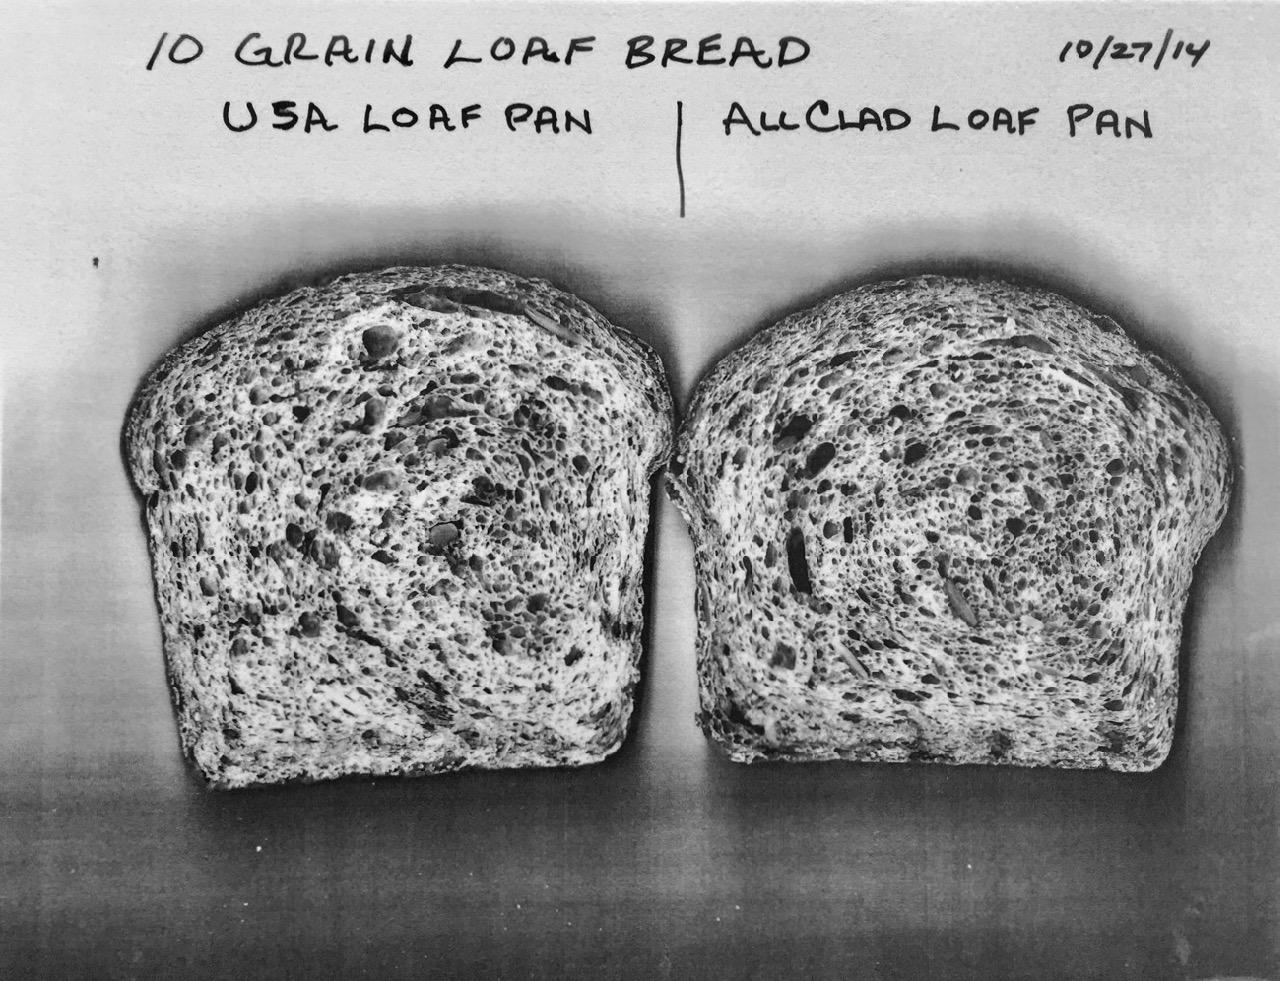 Testing usa vs all clad loaf pans for 10 grain (multigrain) bread